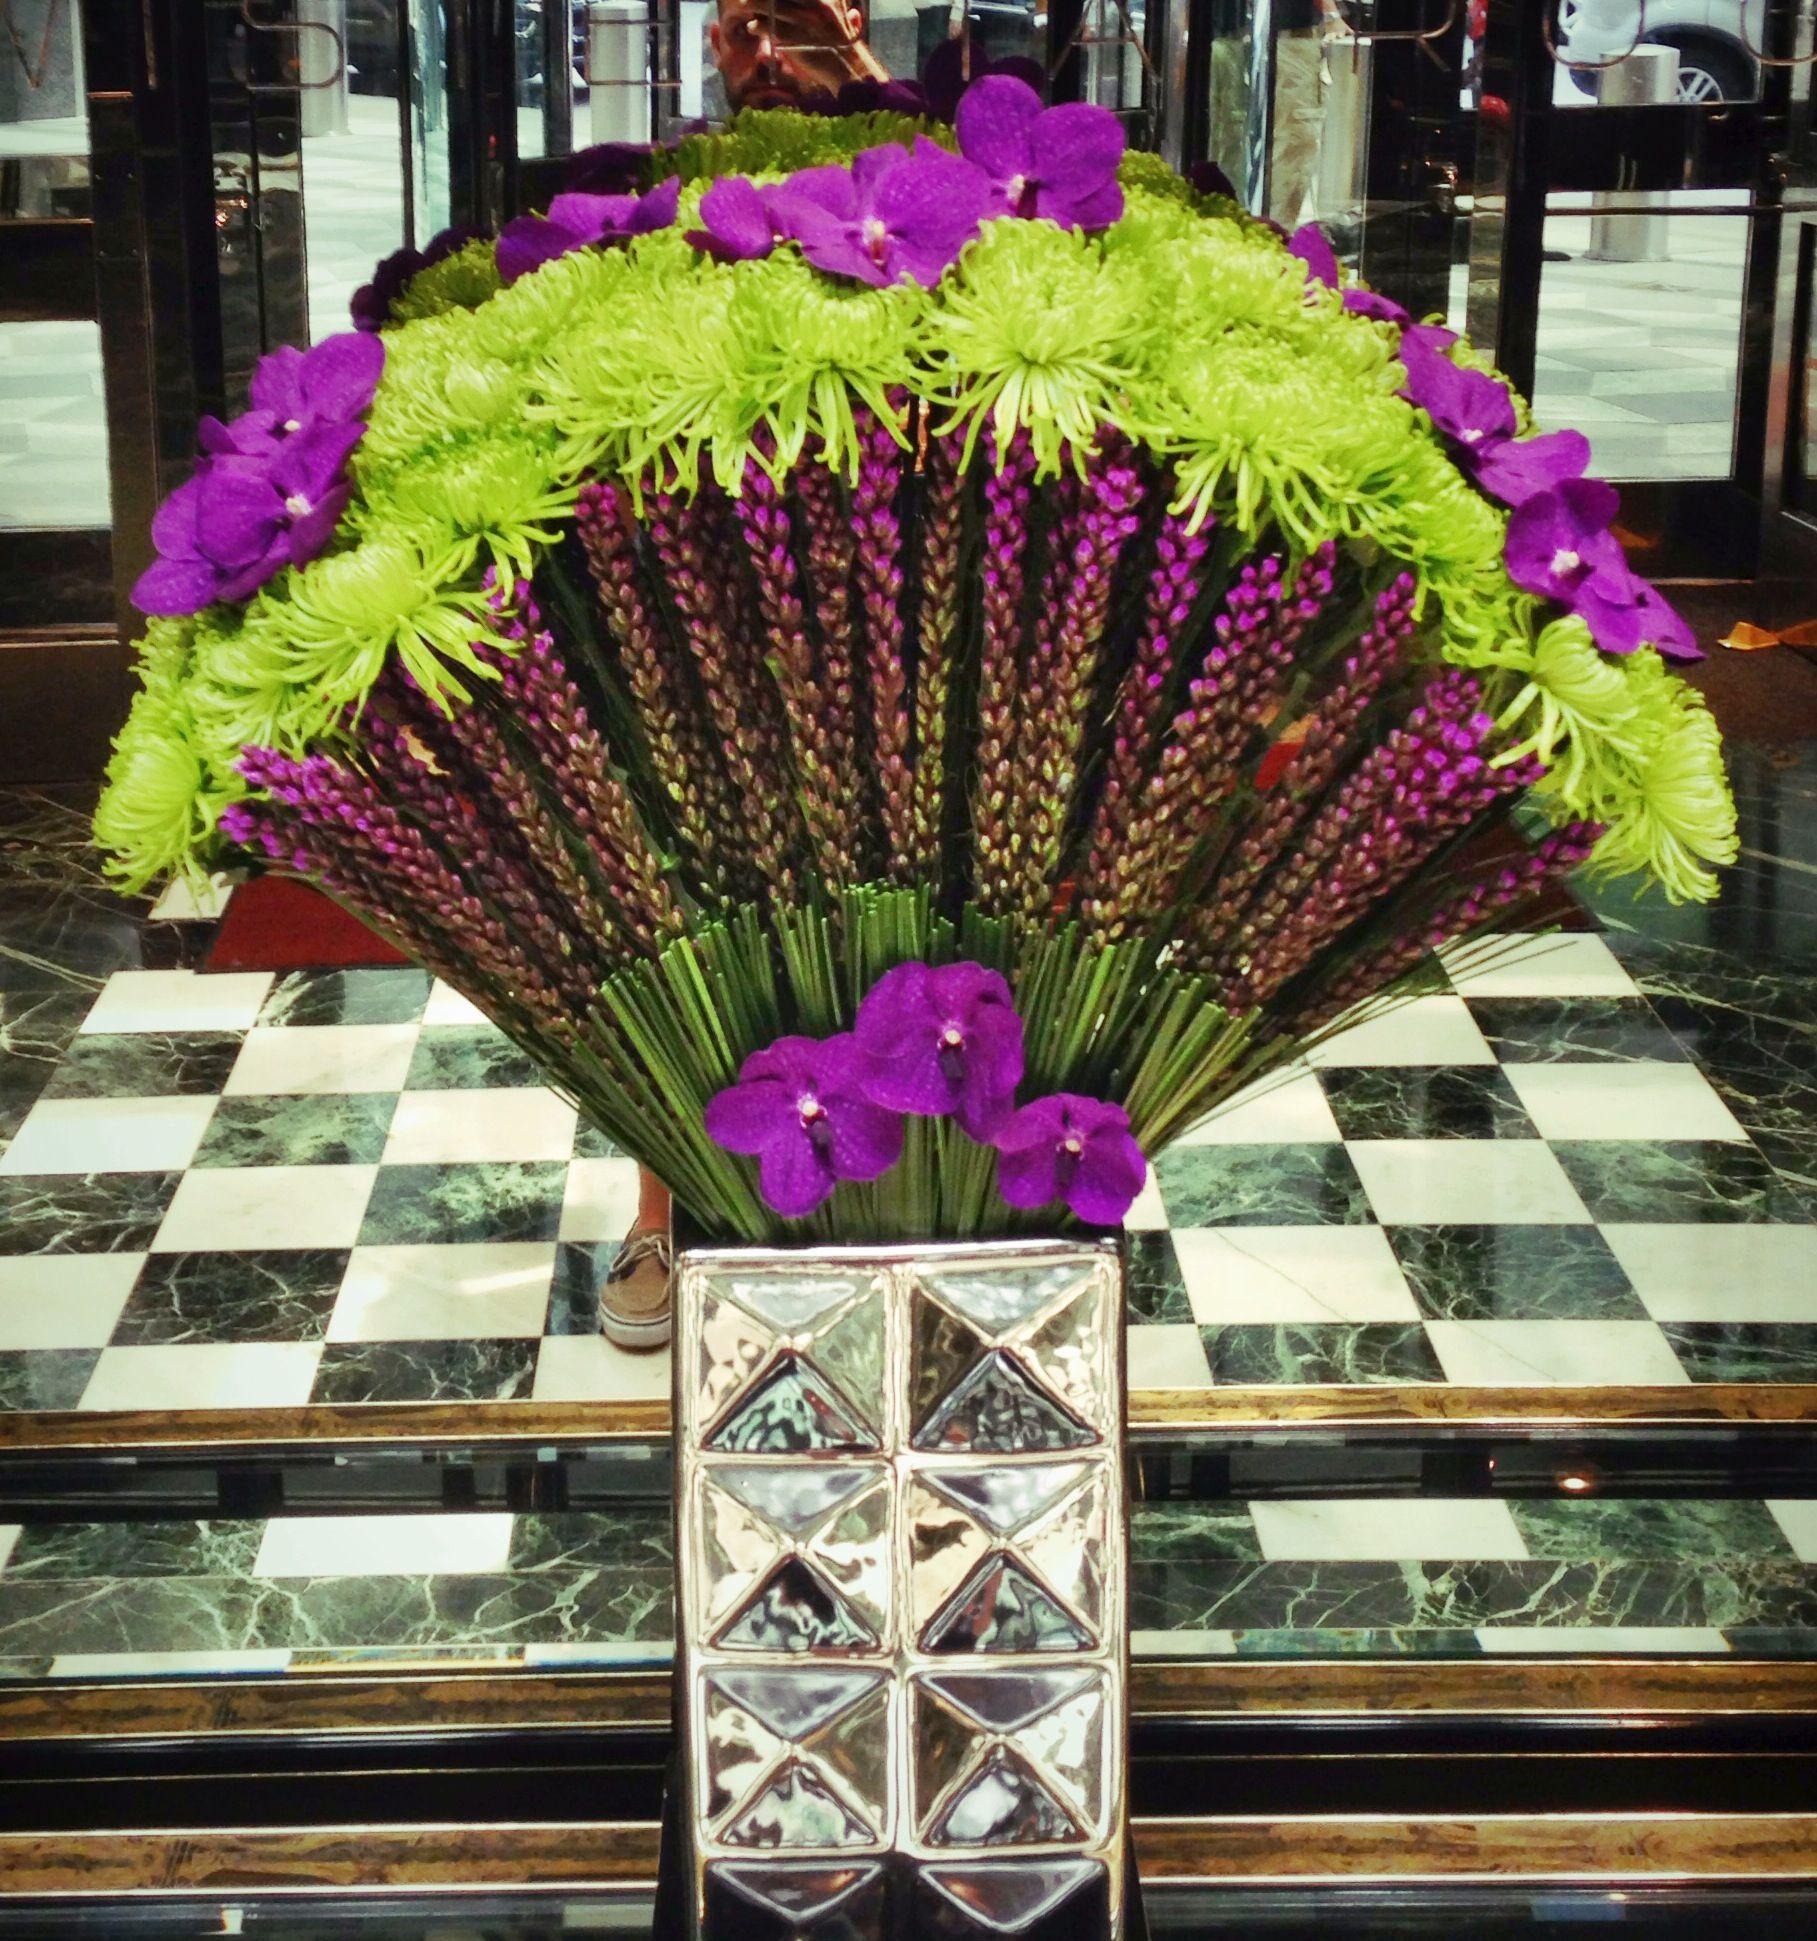 Hotel Foyer Flower Arrangements : Hotel lobby flower arrangement floral sign idea